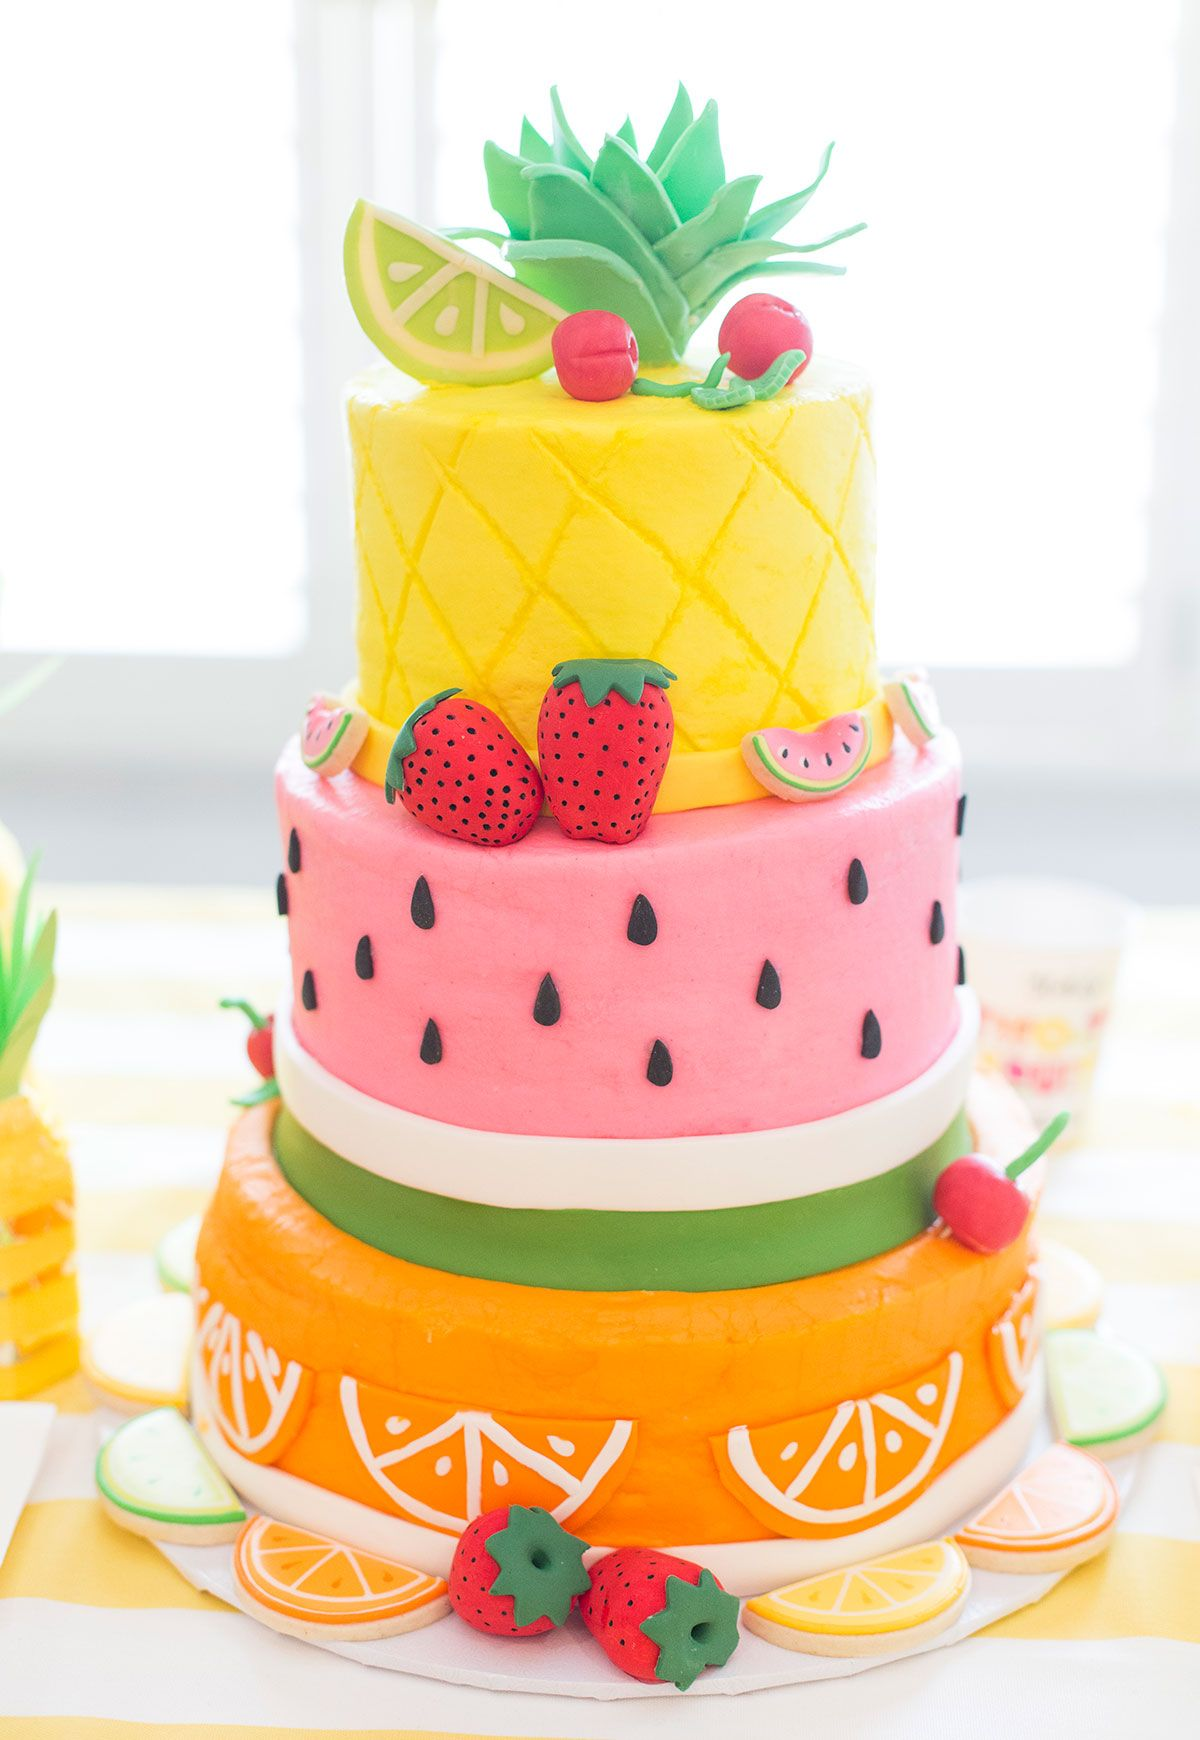 Twotti Fruity Birthday Party Blakely Turns 2 Pizzazzerie